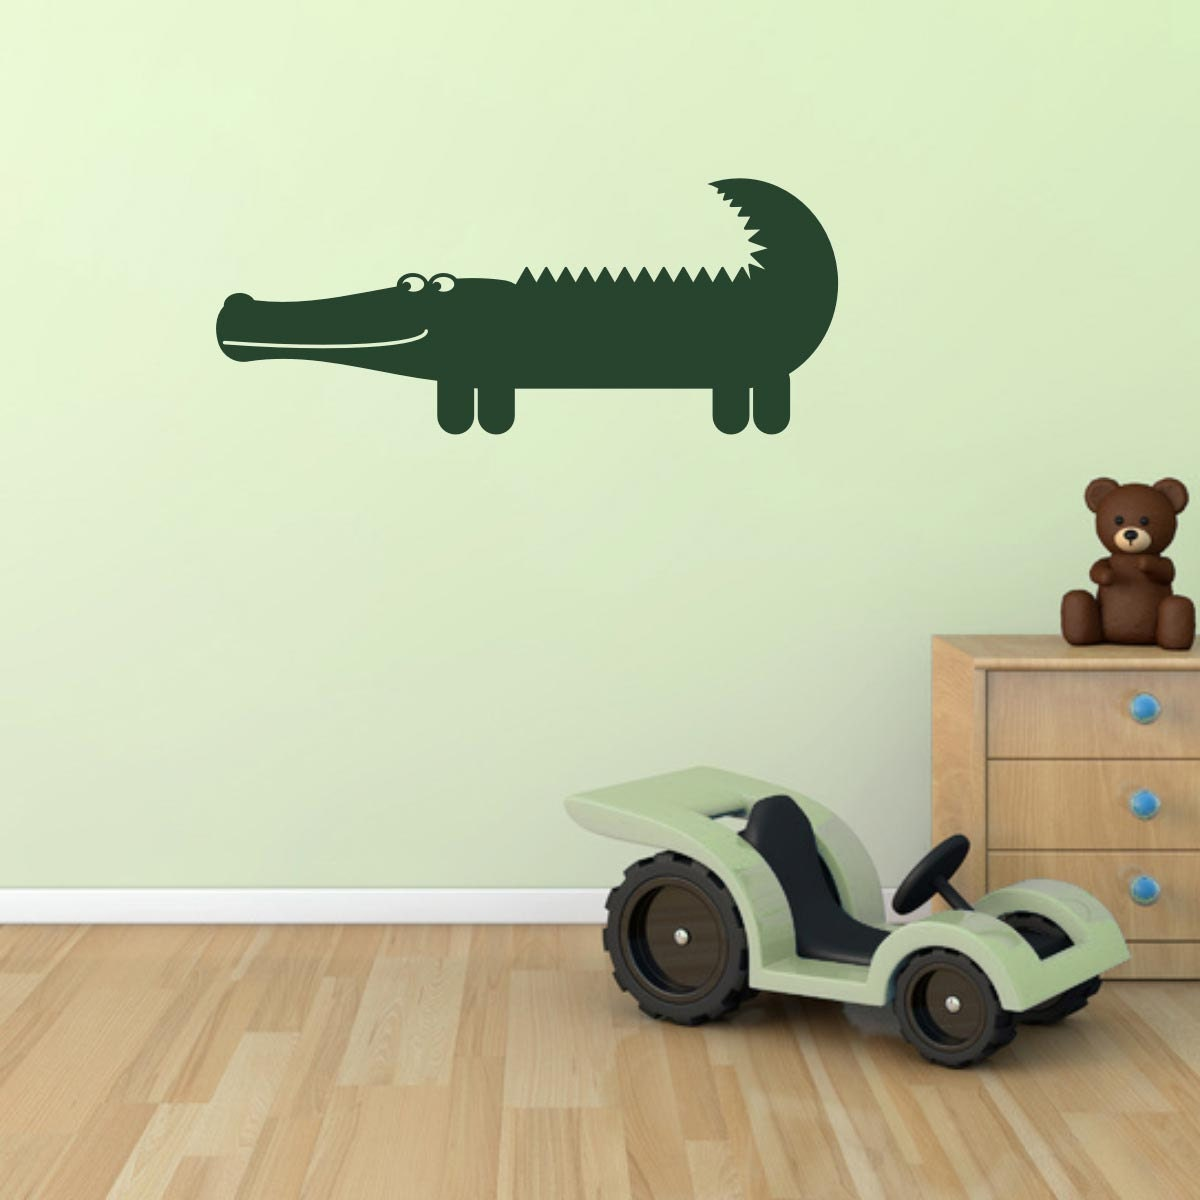 Crocodile Wall Sticker Crocodile Wall Decal Nursery Animal Wall Art Jungle Wall Transfers  AN040